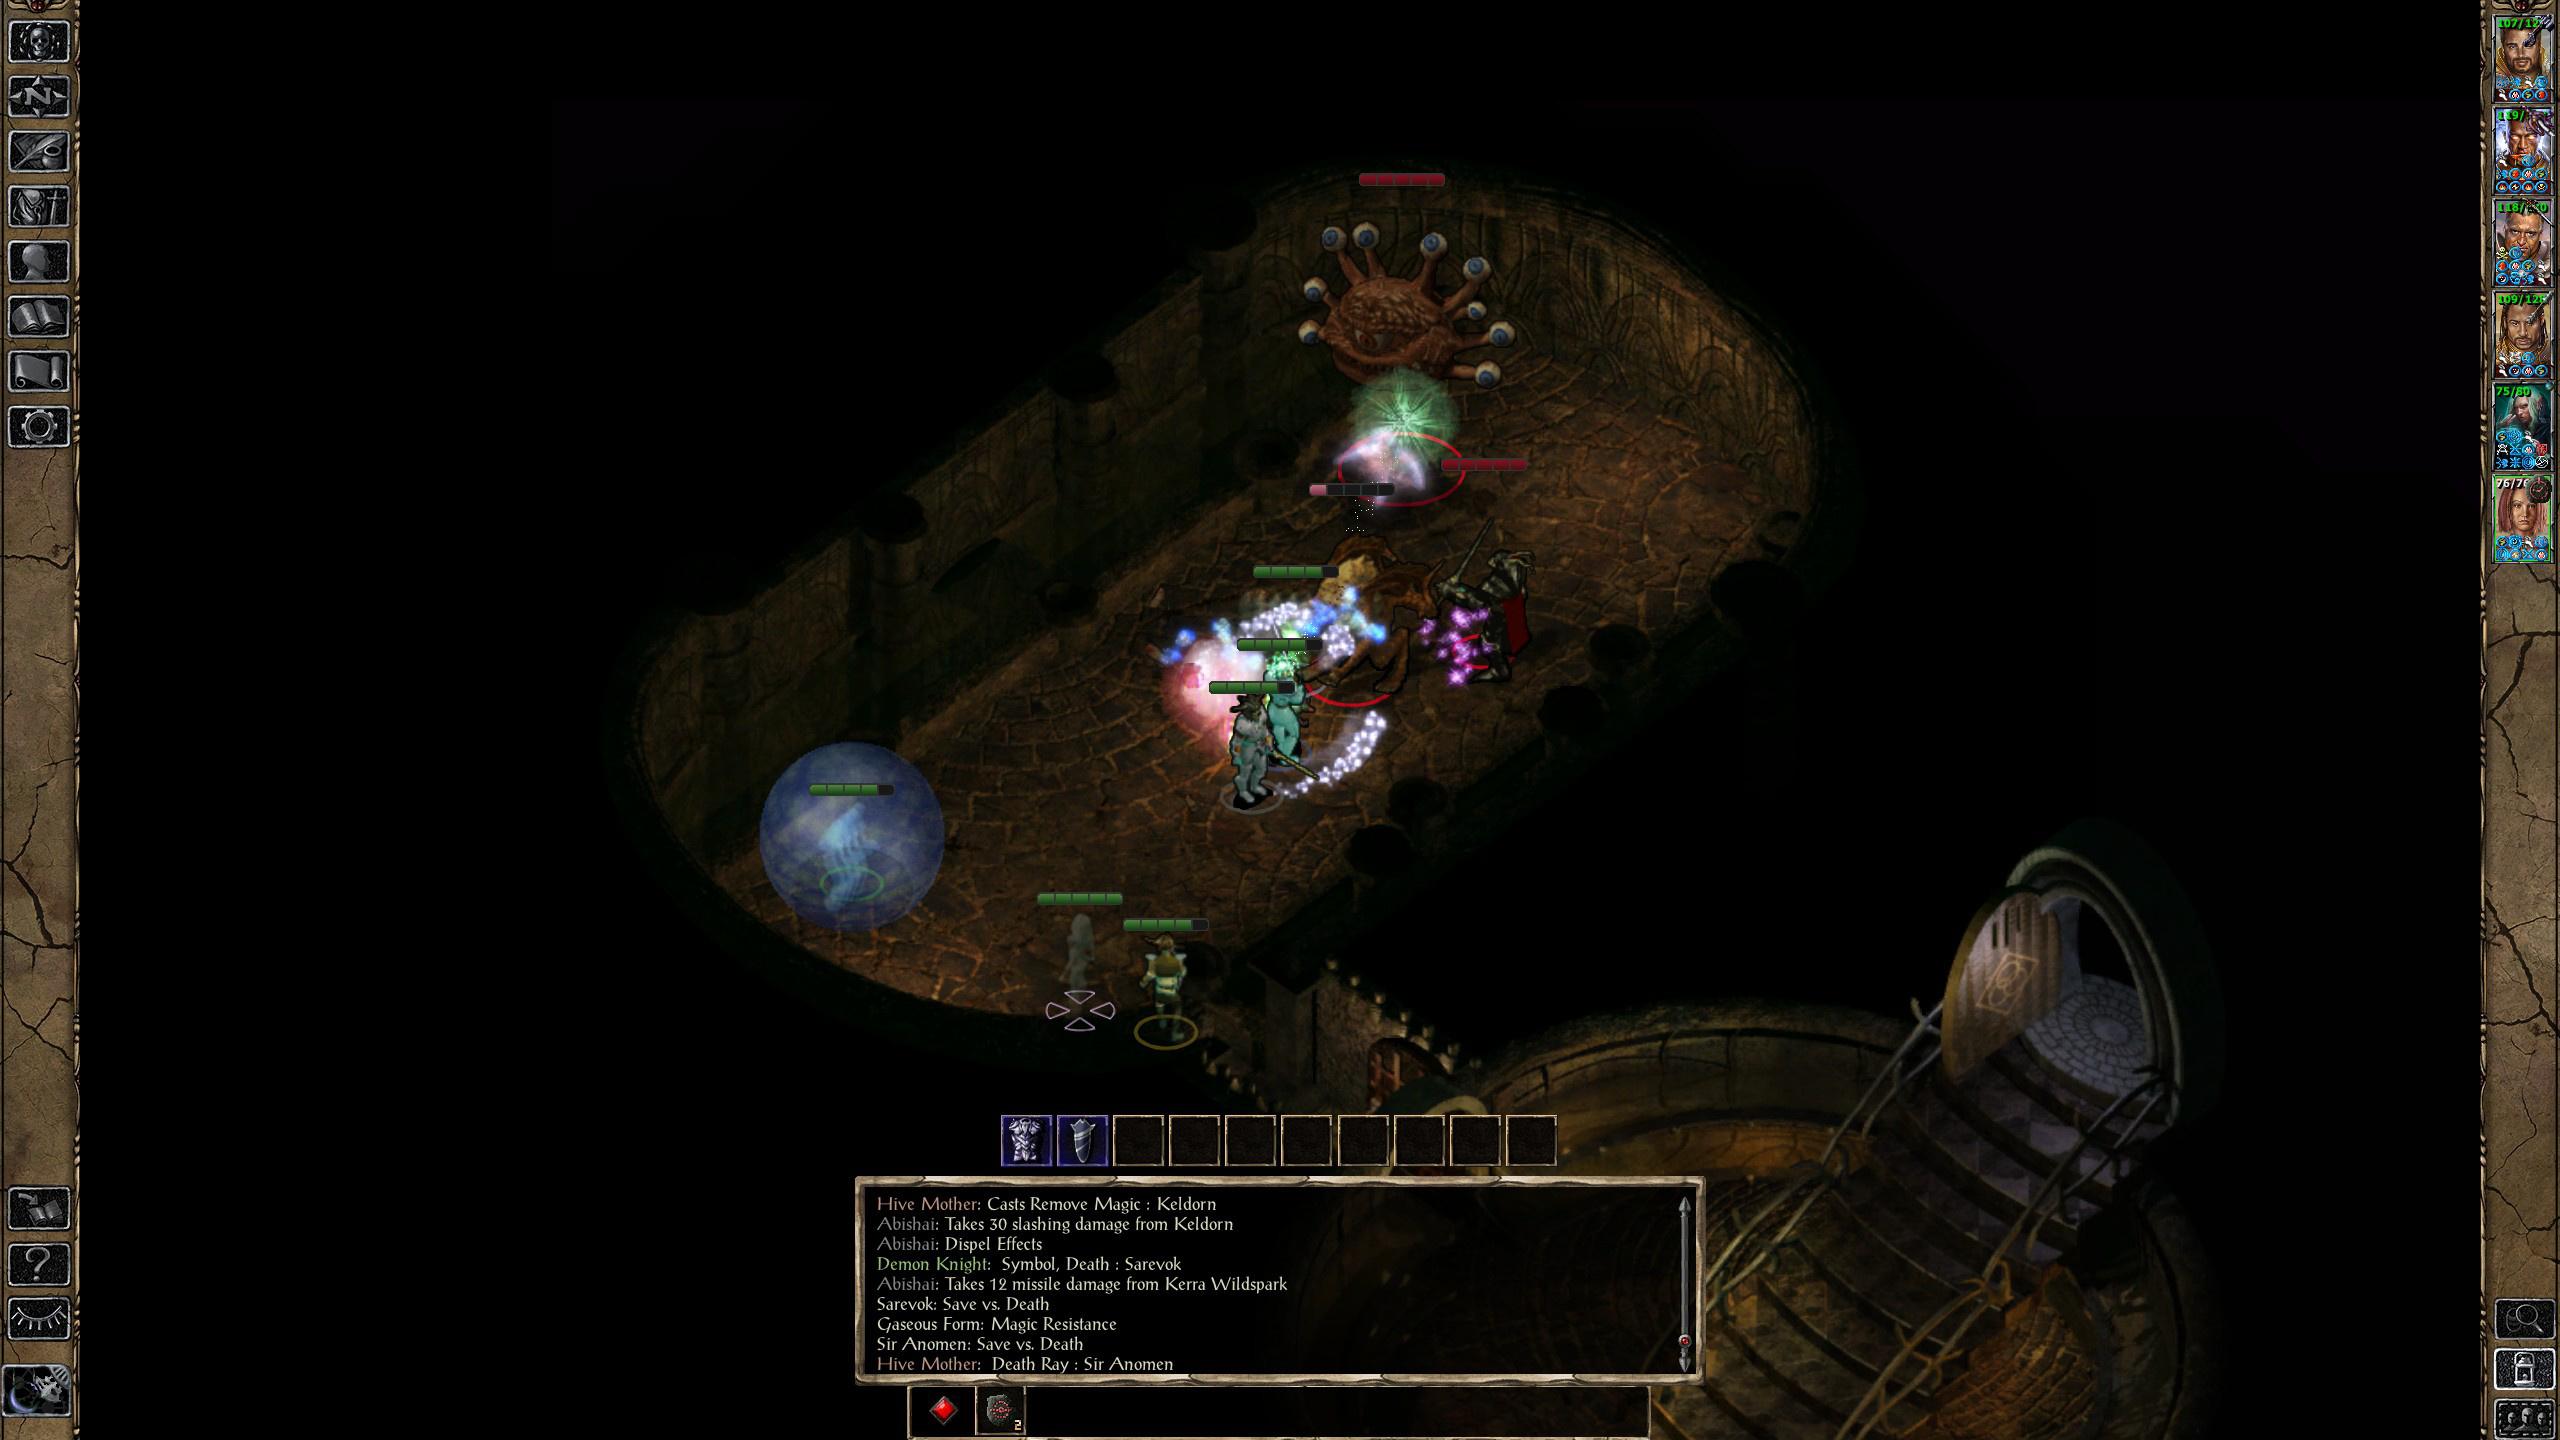 Pillars of Eternity - Games - Quarter To Three Forums